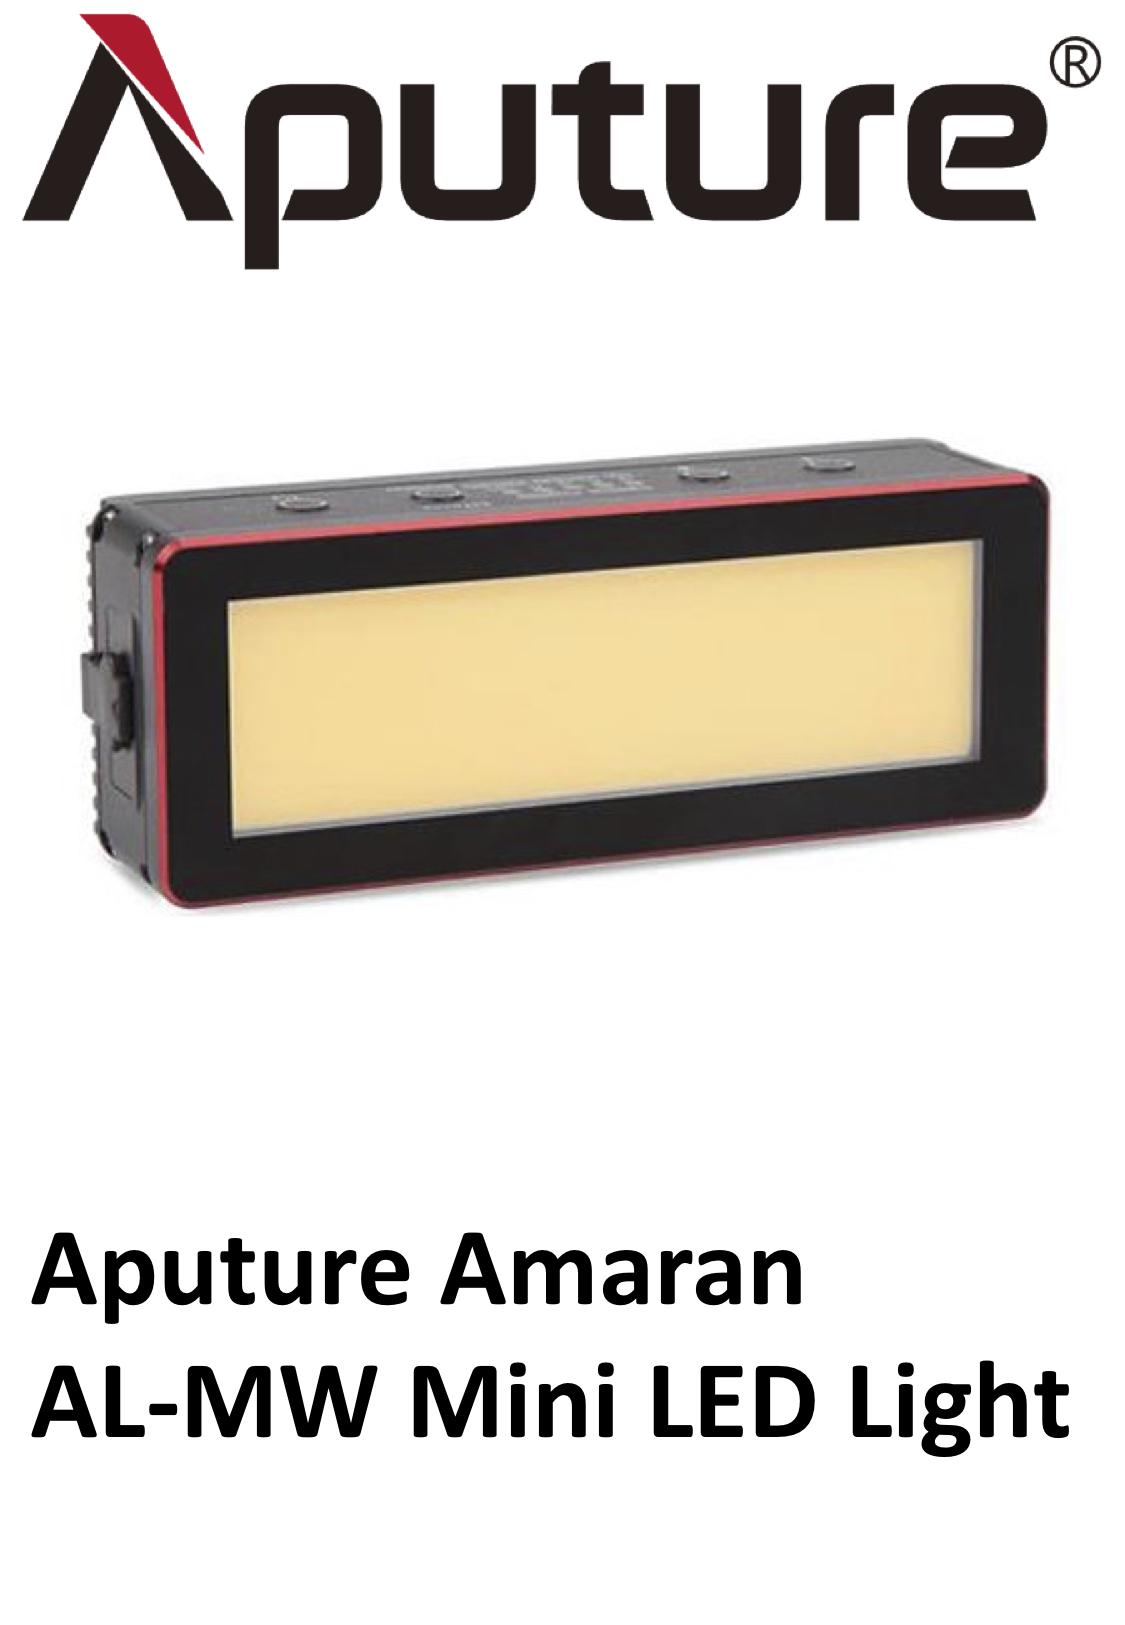 Aputure Amaran Al-Mw Mini Led Light.